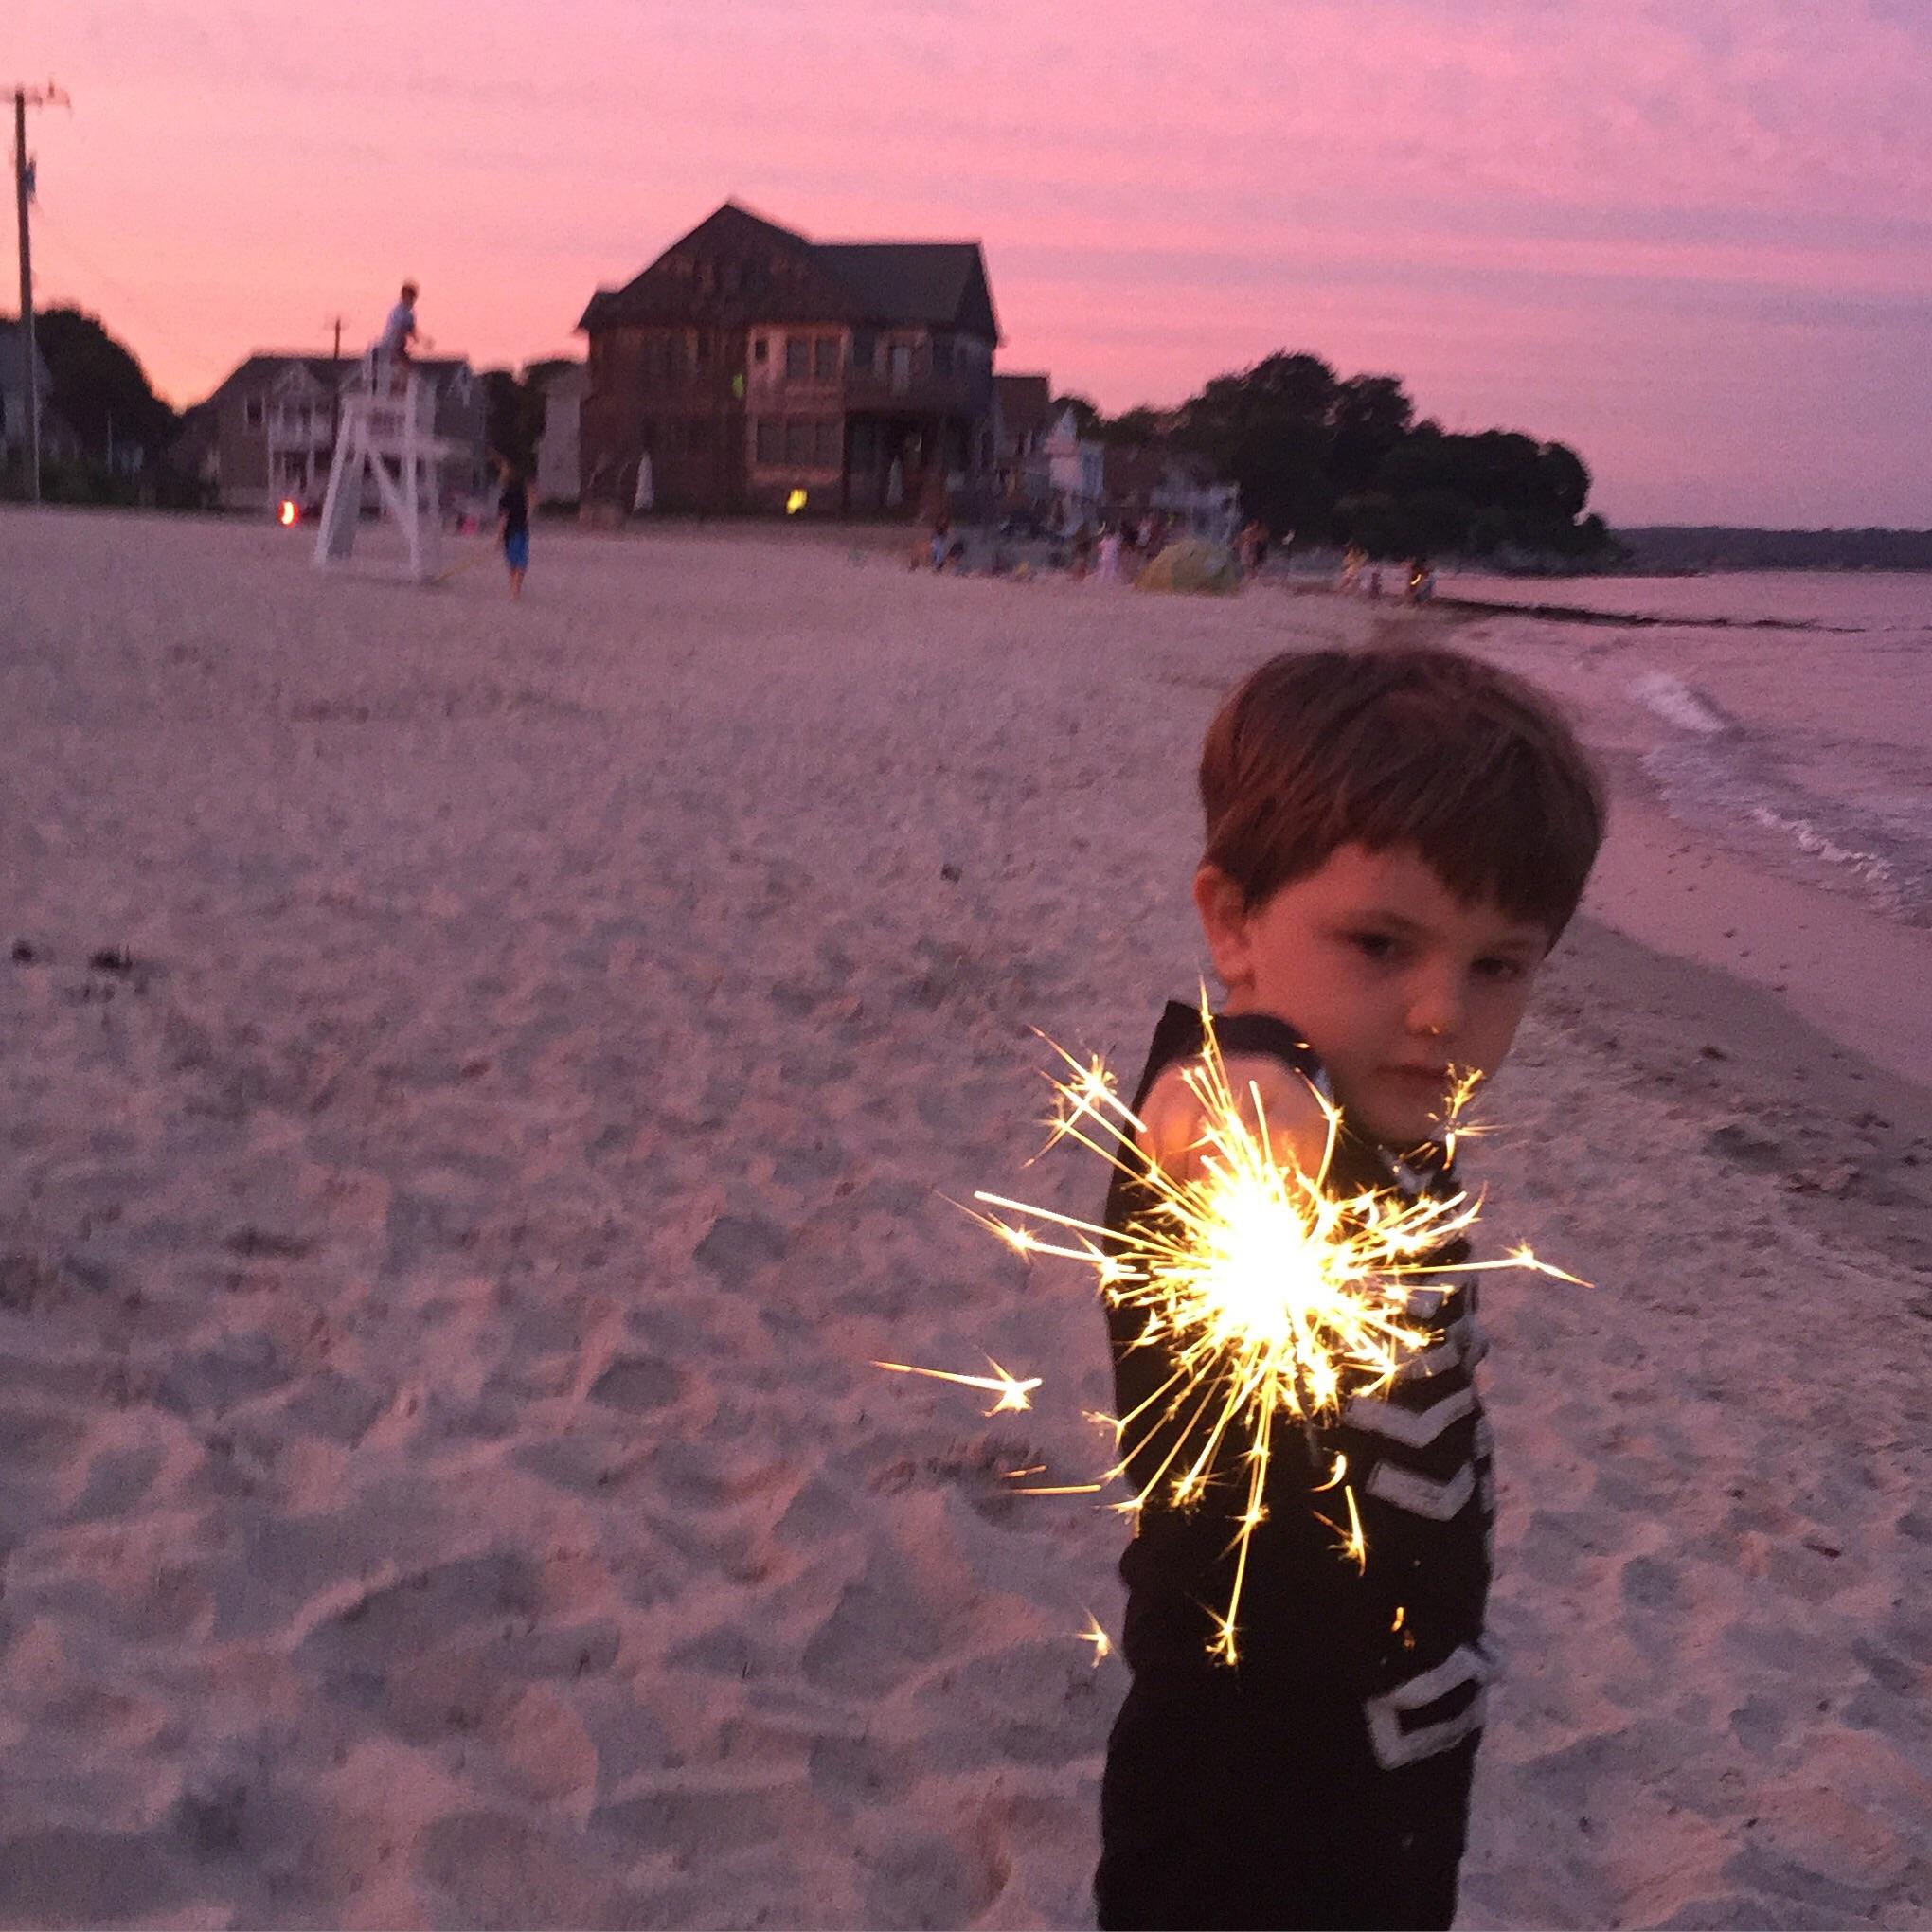 Magic hour, July 4th, Crescent Beach. No filter.